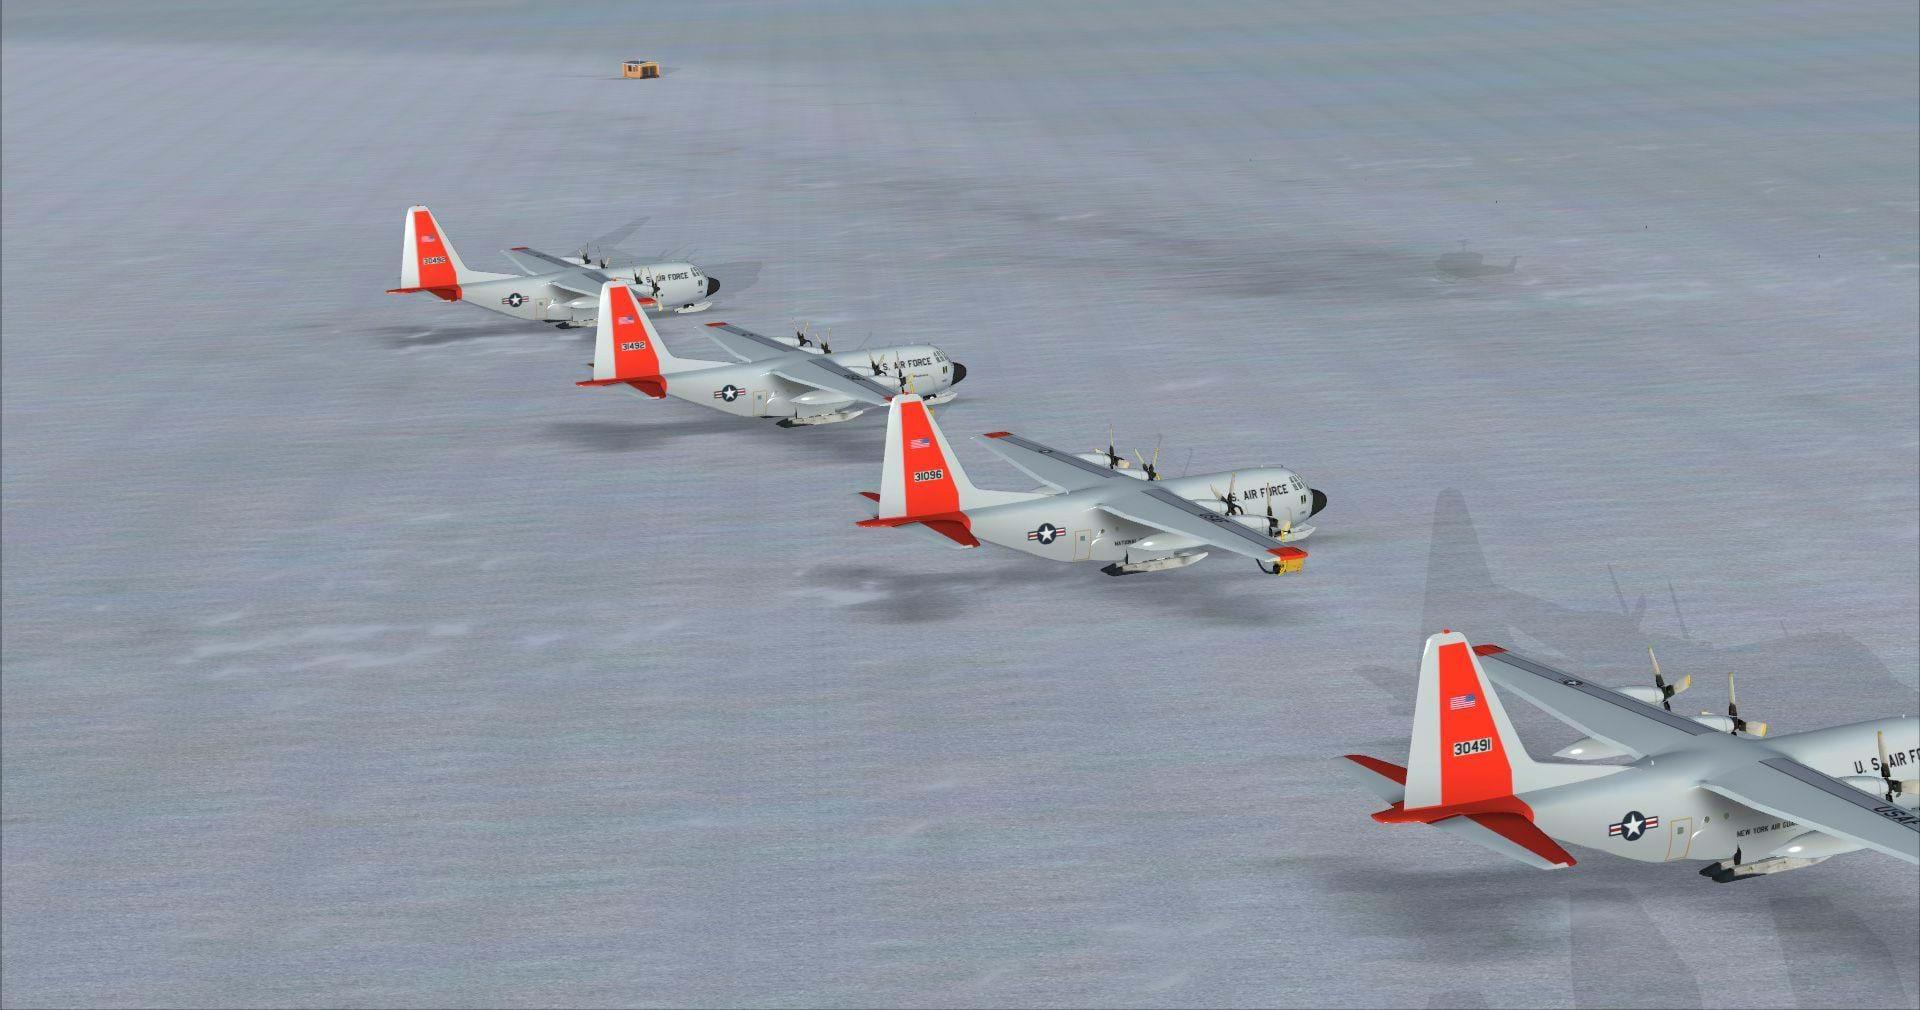 Review: Aerosoft Antarctica X for FSX and Prepar3D